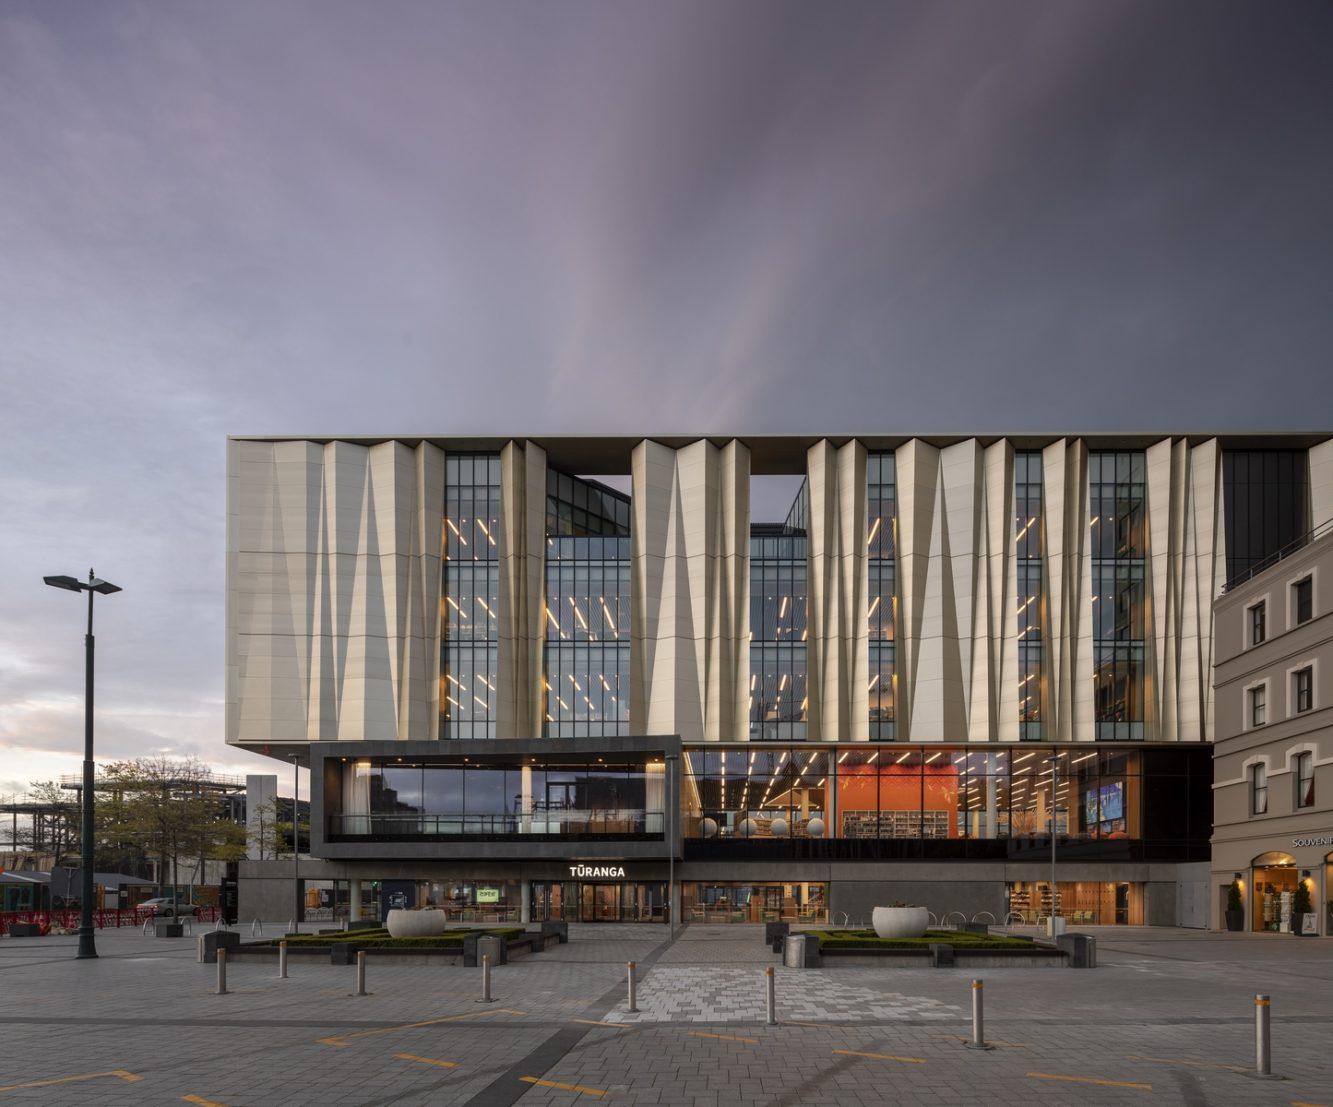 Tūranga_Christchurch New Central Library_003 (Copiar)